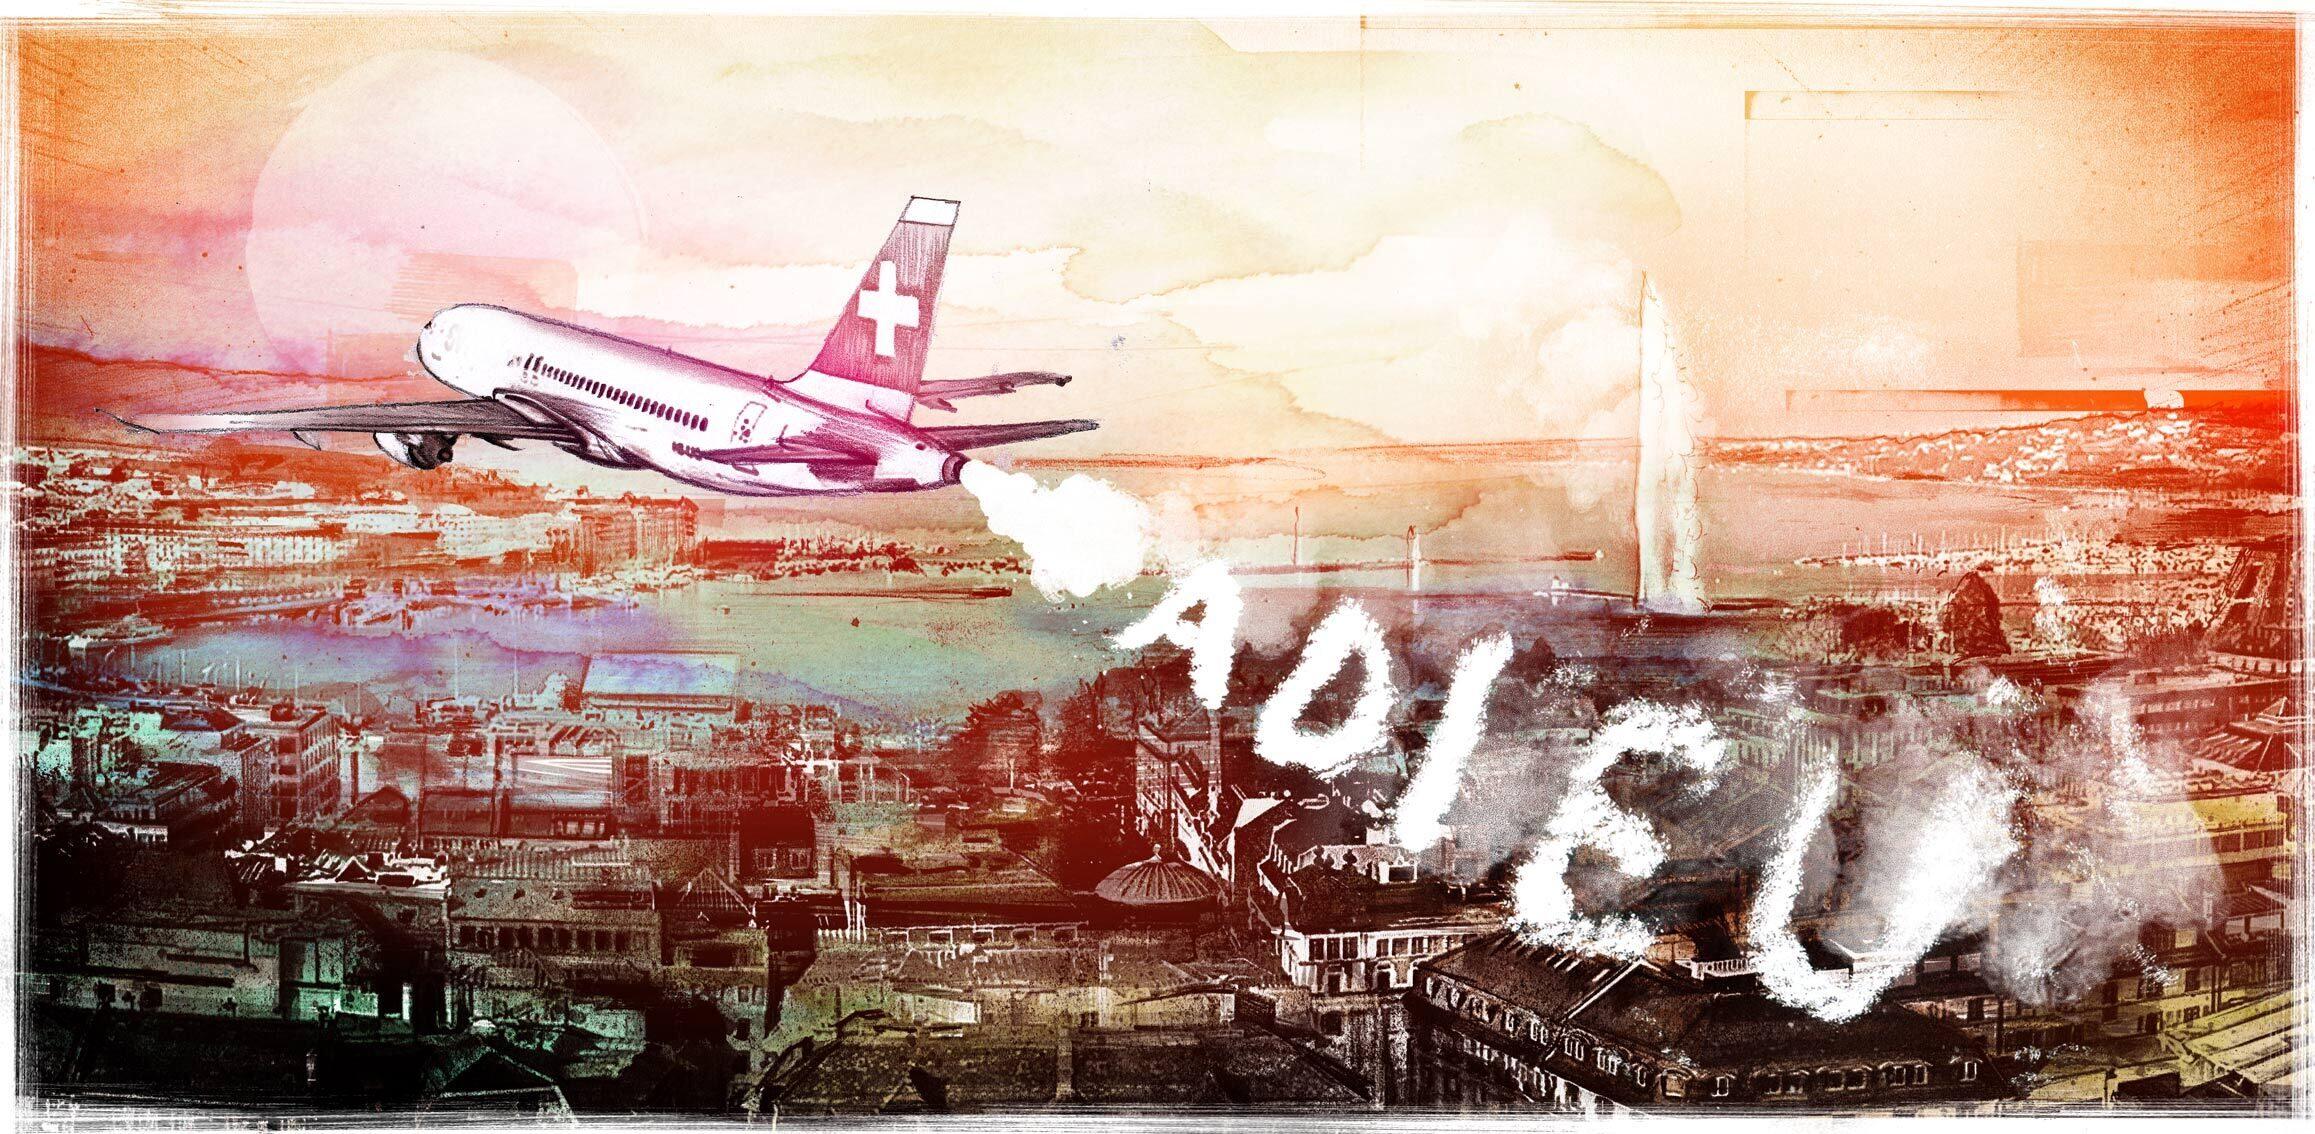 Adieu Swiss Illustration travel genf geneva - Kornel Illustration | Kornel Stadler portfolio